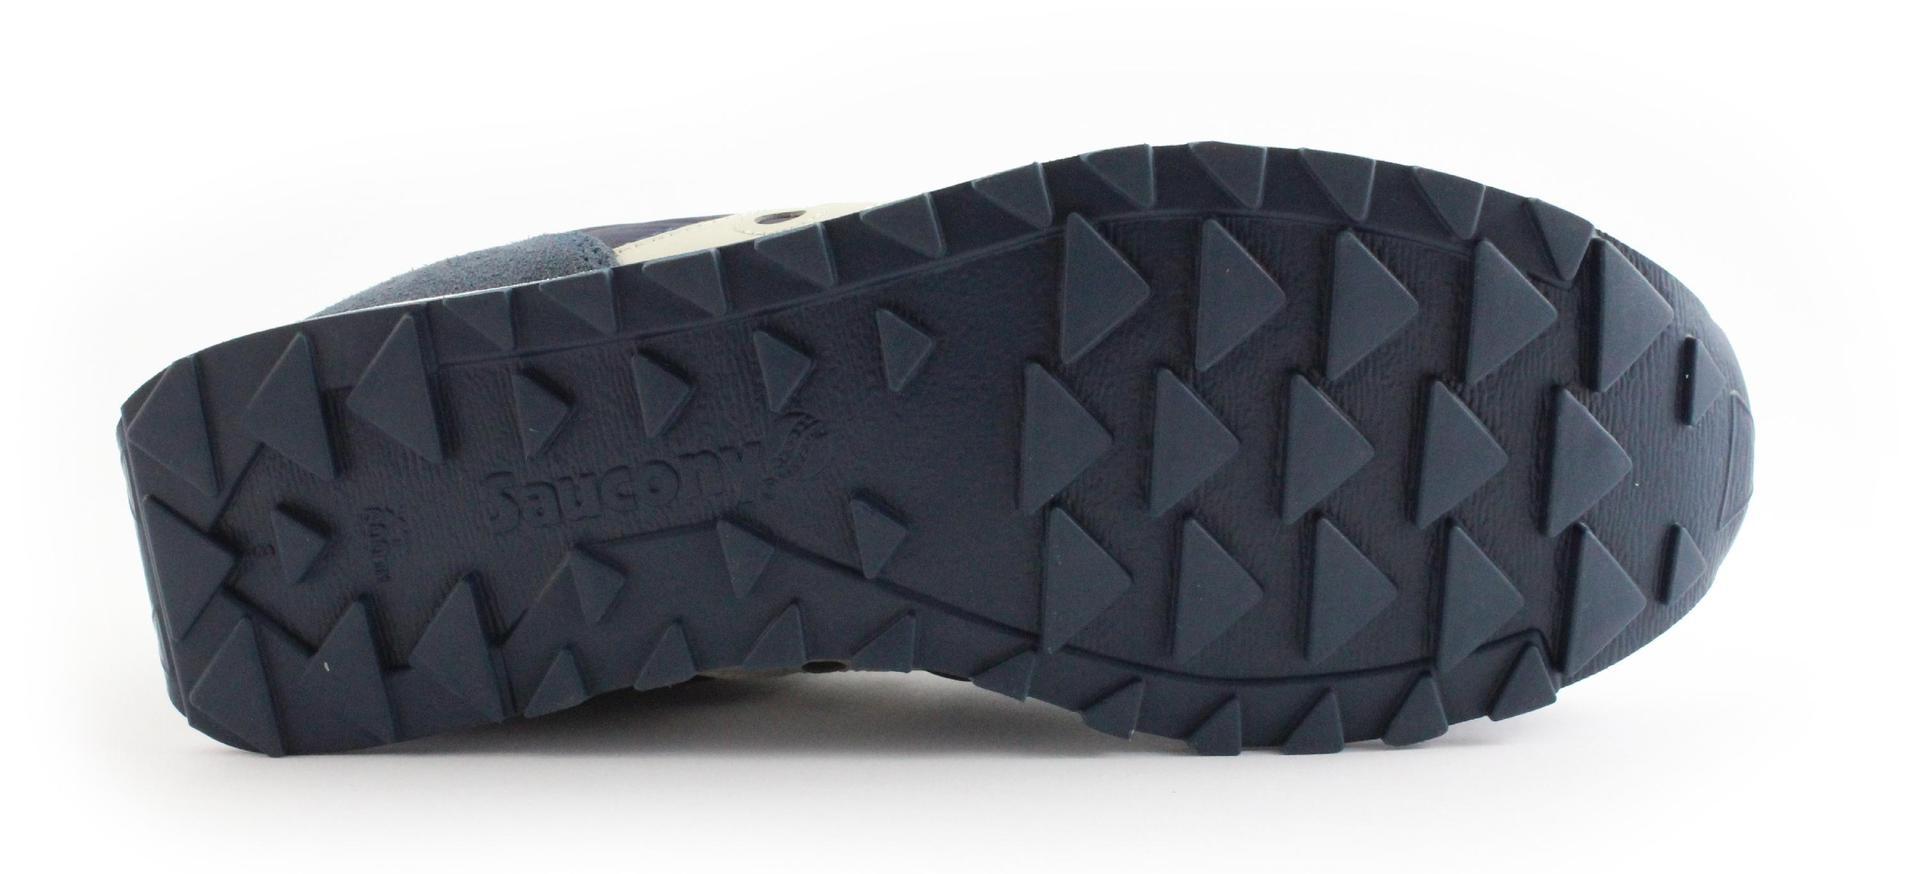 Sneaker Saucony JAZZ ORIGINAL NAVY OFF WHITE S2044-373  2191a66c081